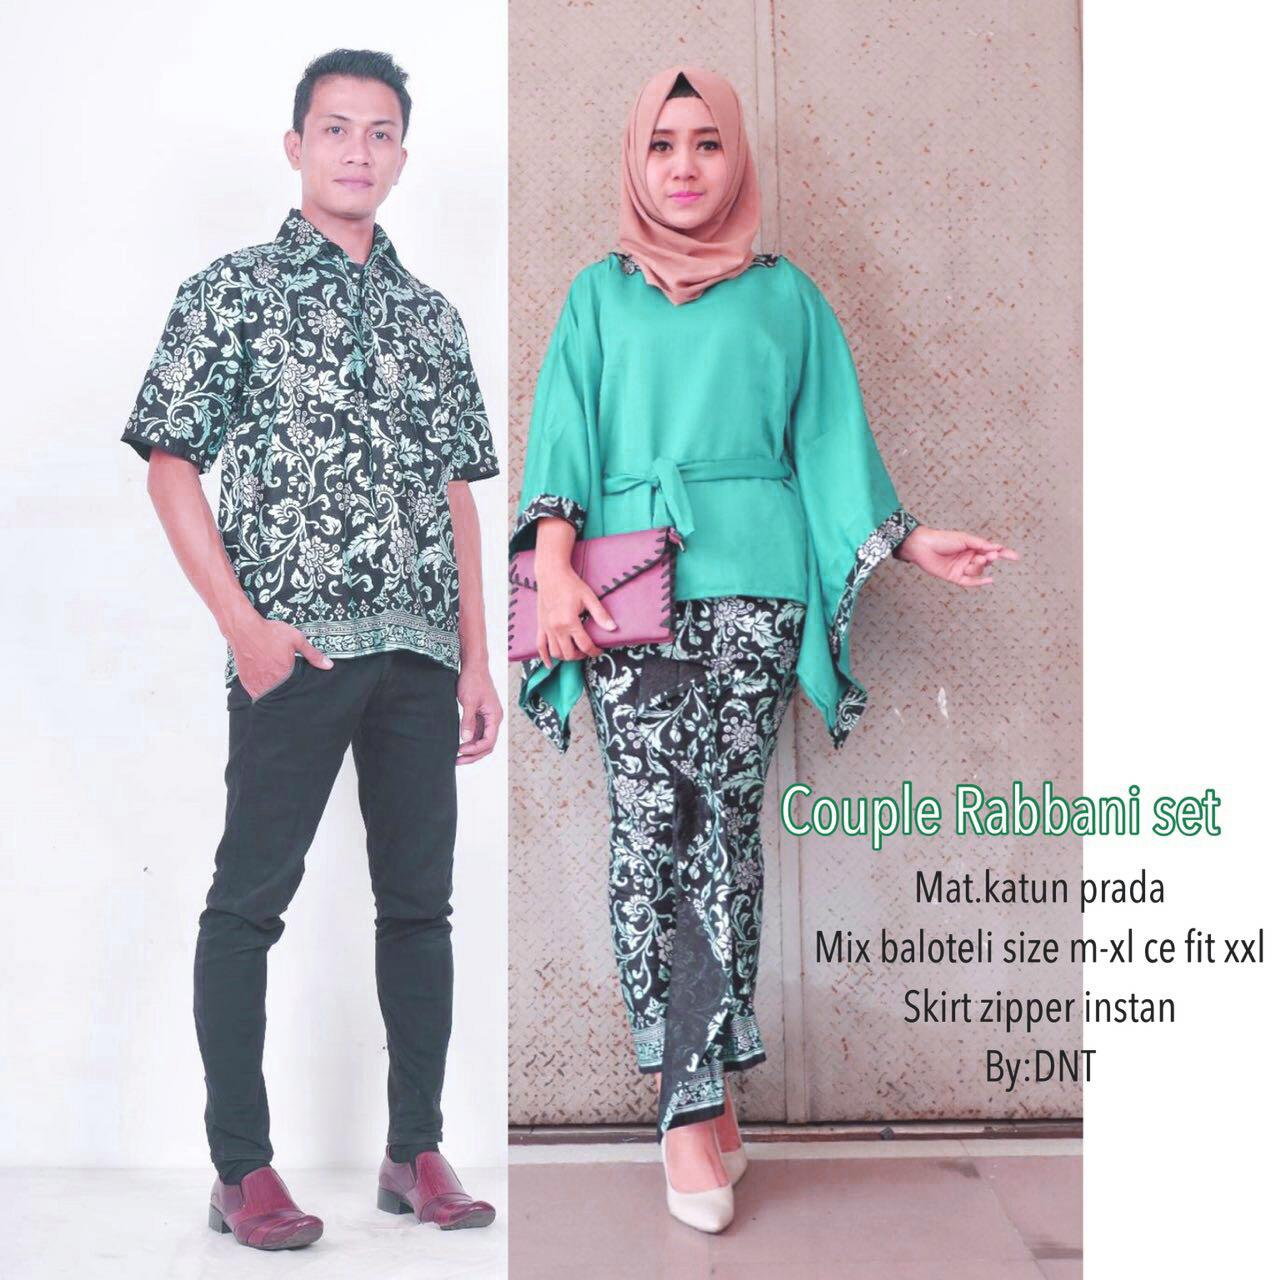 Saudah Baju batik_Baju Batik Couple_Baju Batik Sarimbit_Baju Batik Pasangan_Baju Batik Pesta_Baju Batik Keluarga Rabbani Couple